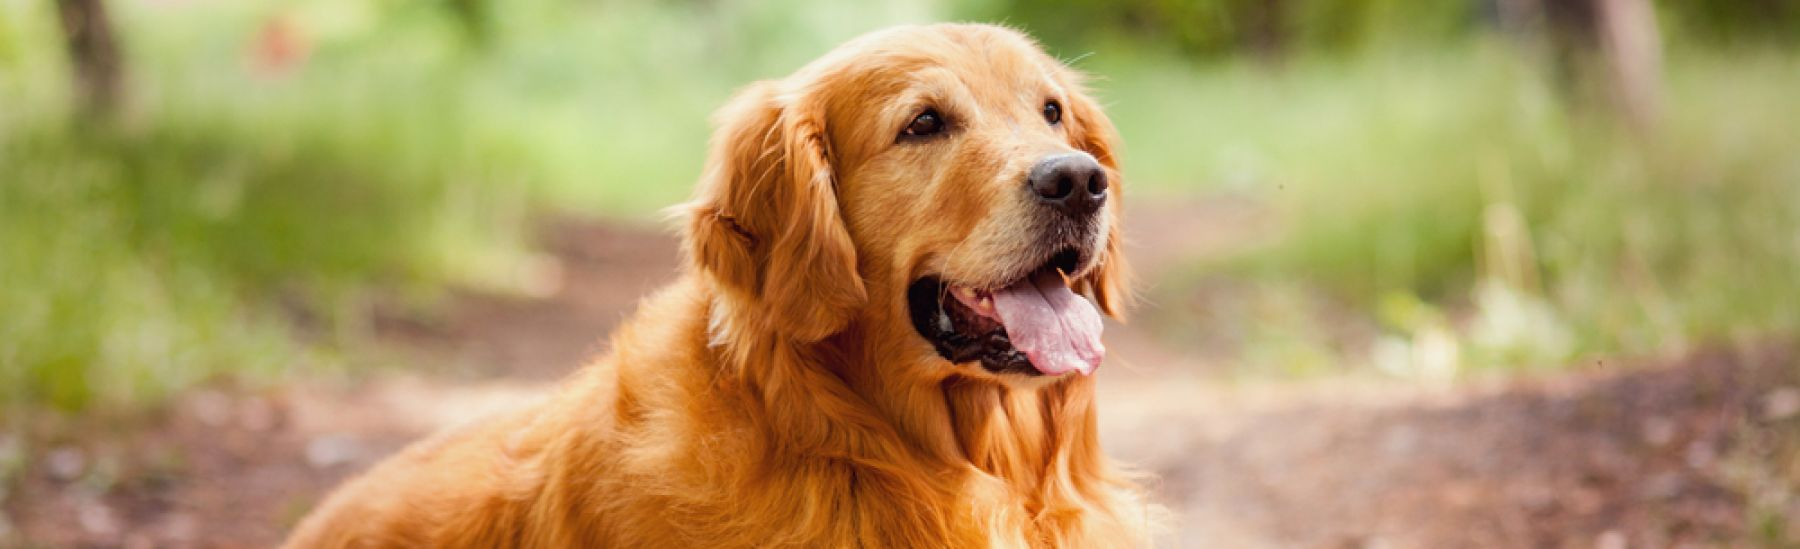 Golden Retriever dog outdoors